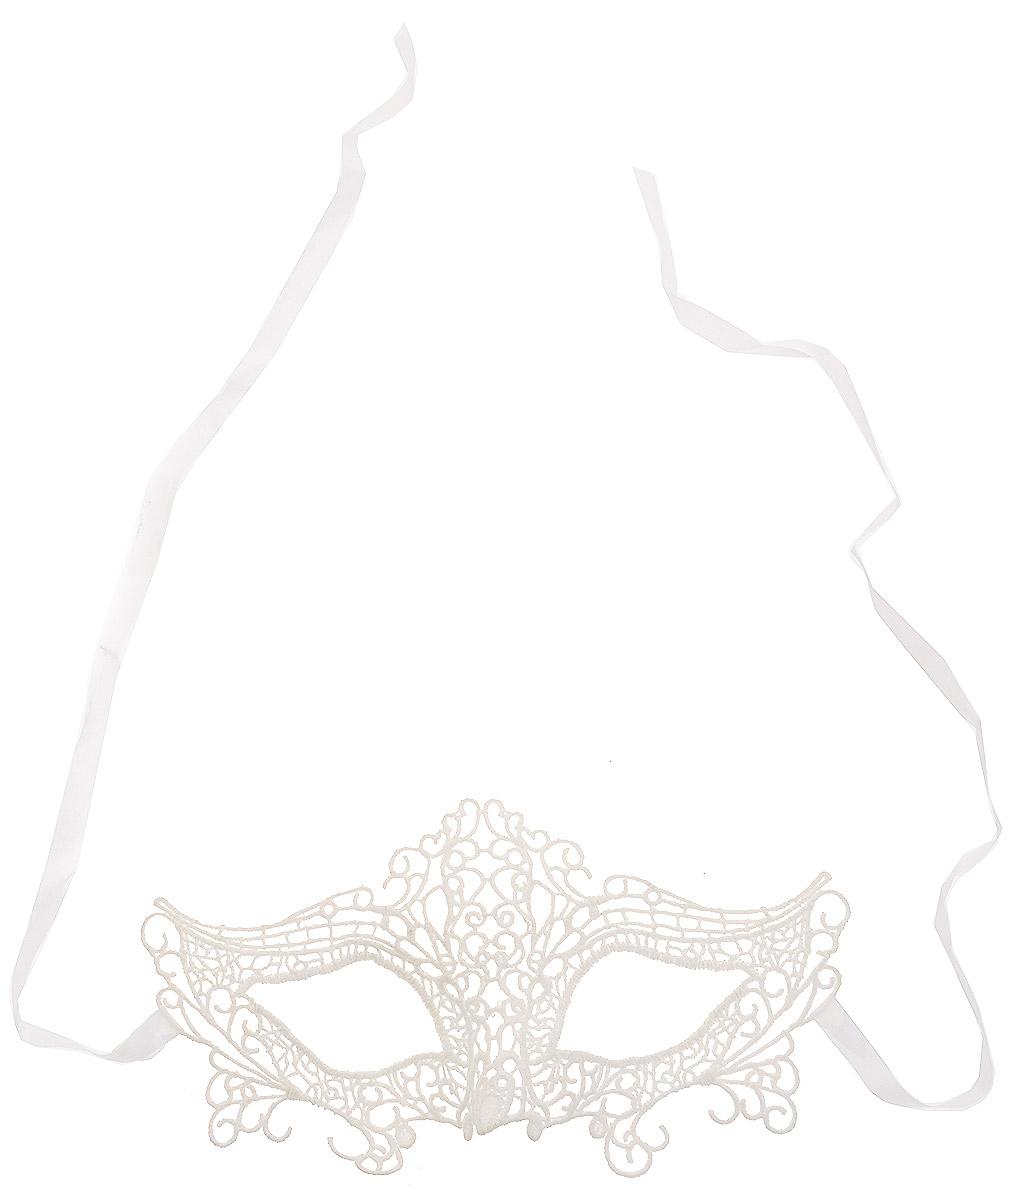 Partymania Карнавальная маска Кружево цвет белый T1228_3